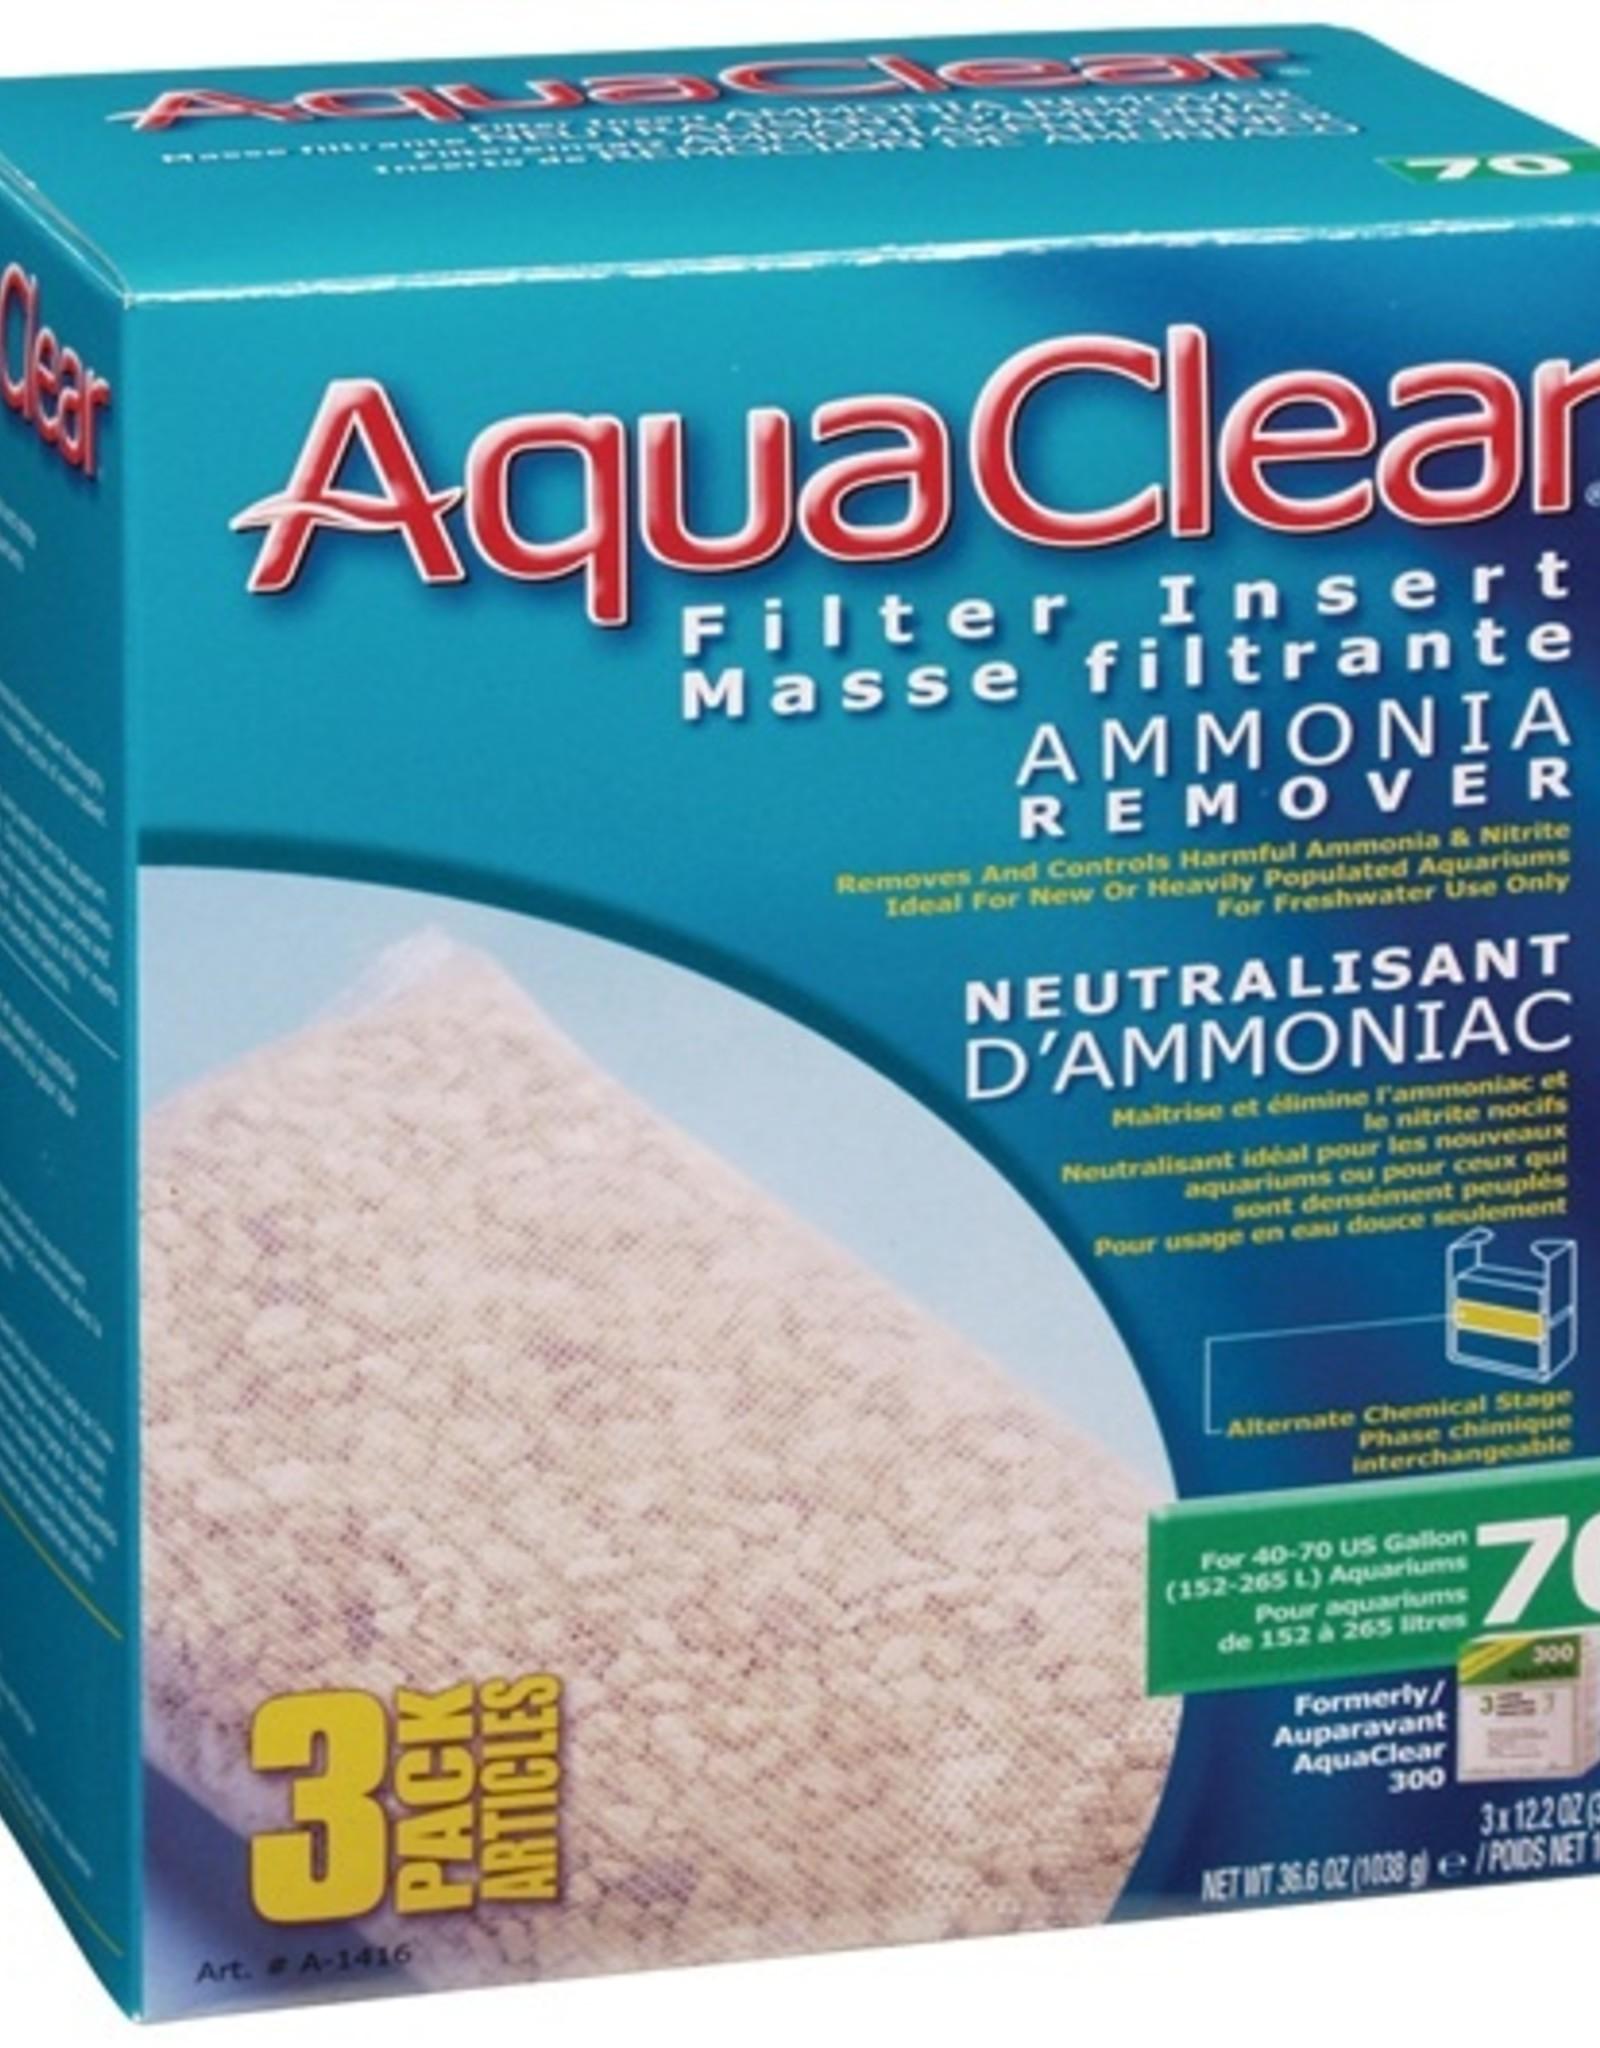 HAGEN AQUA CLEAR 70 AMMONIA REMOVER